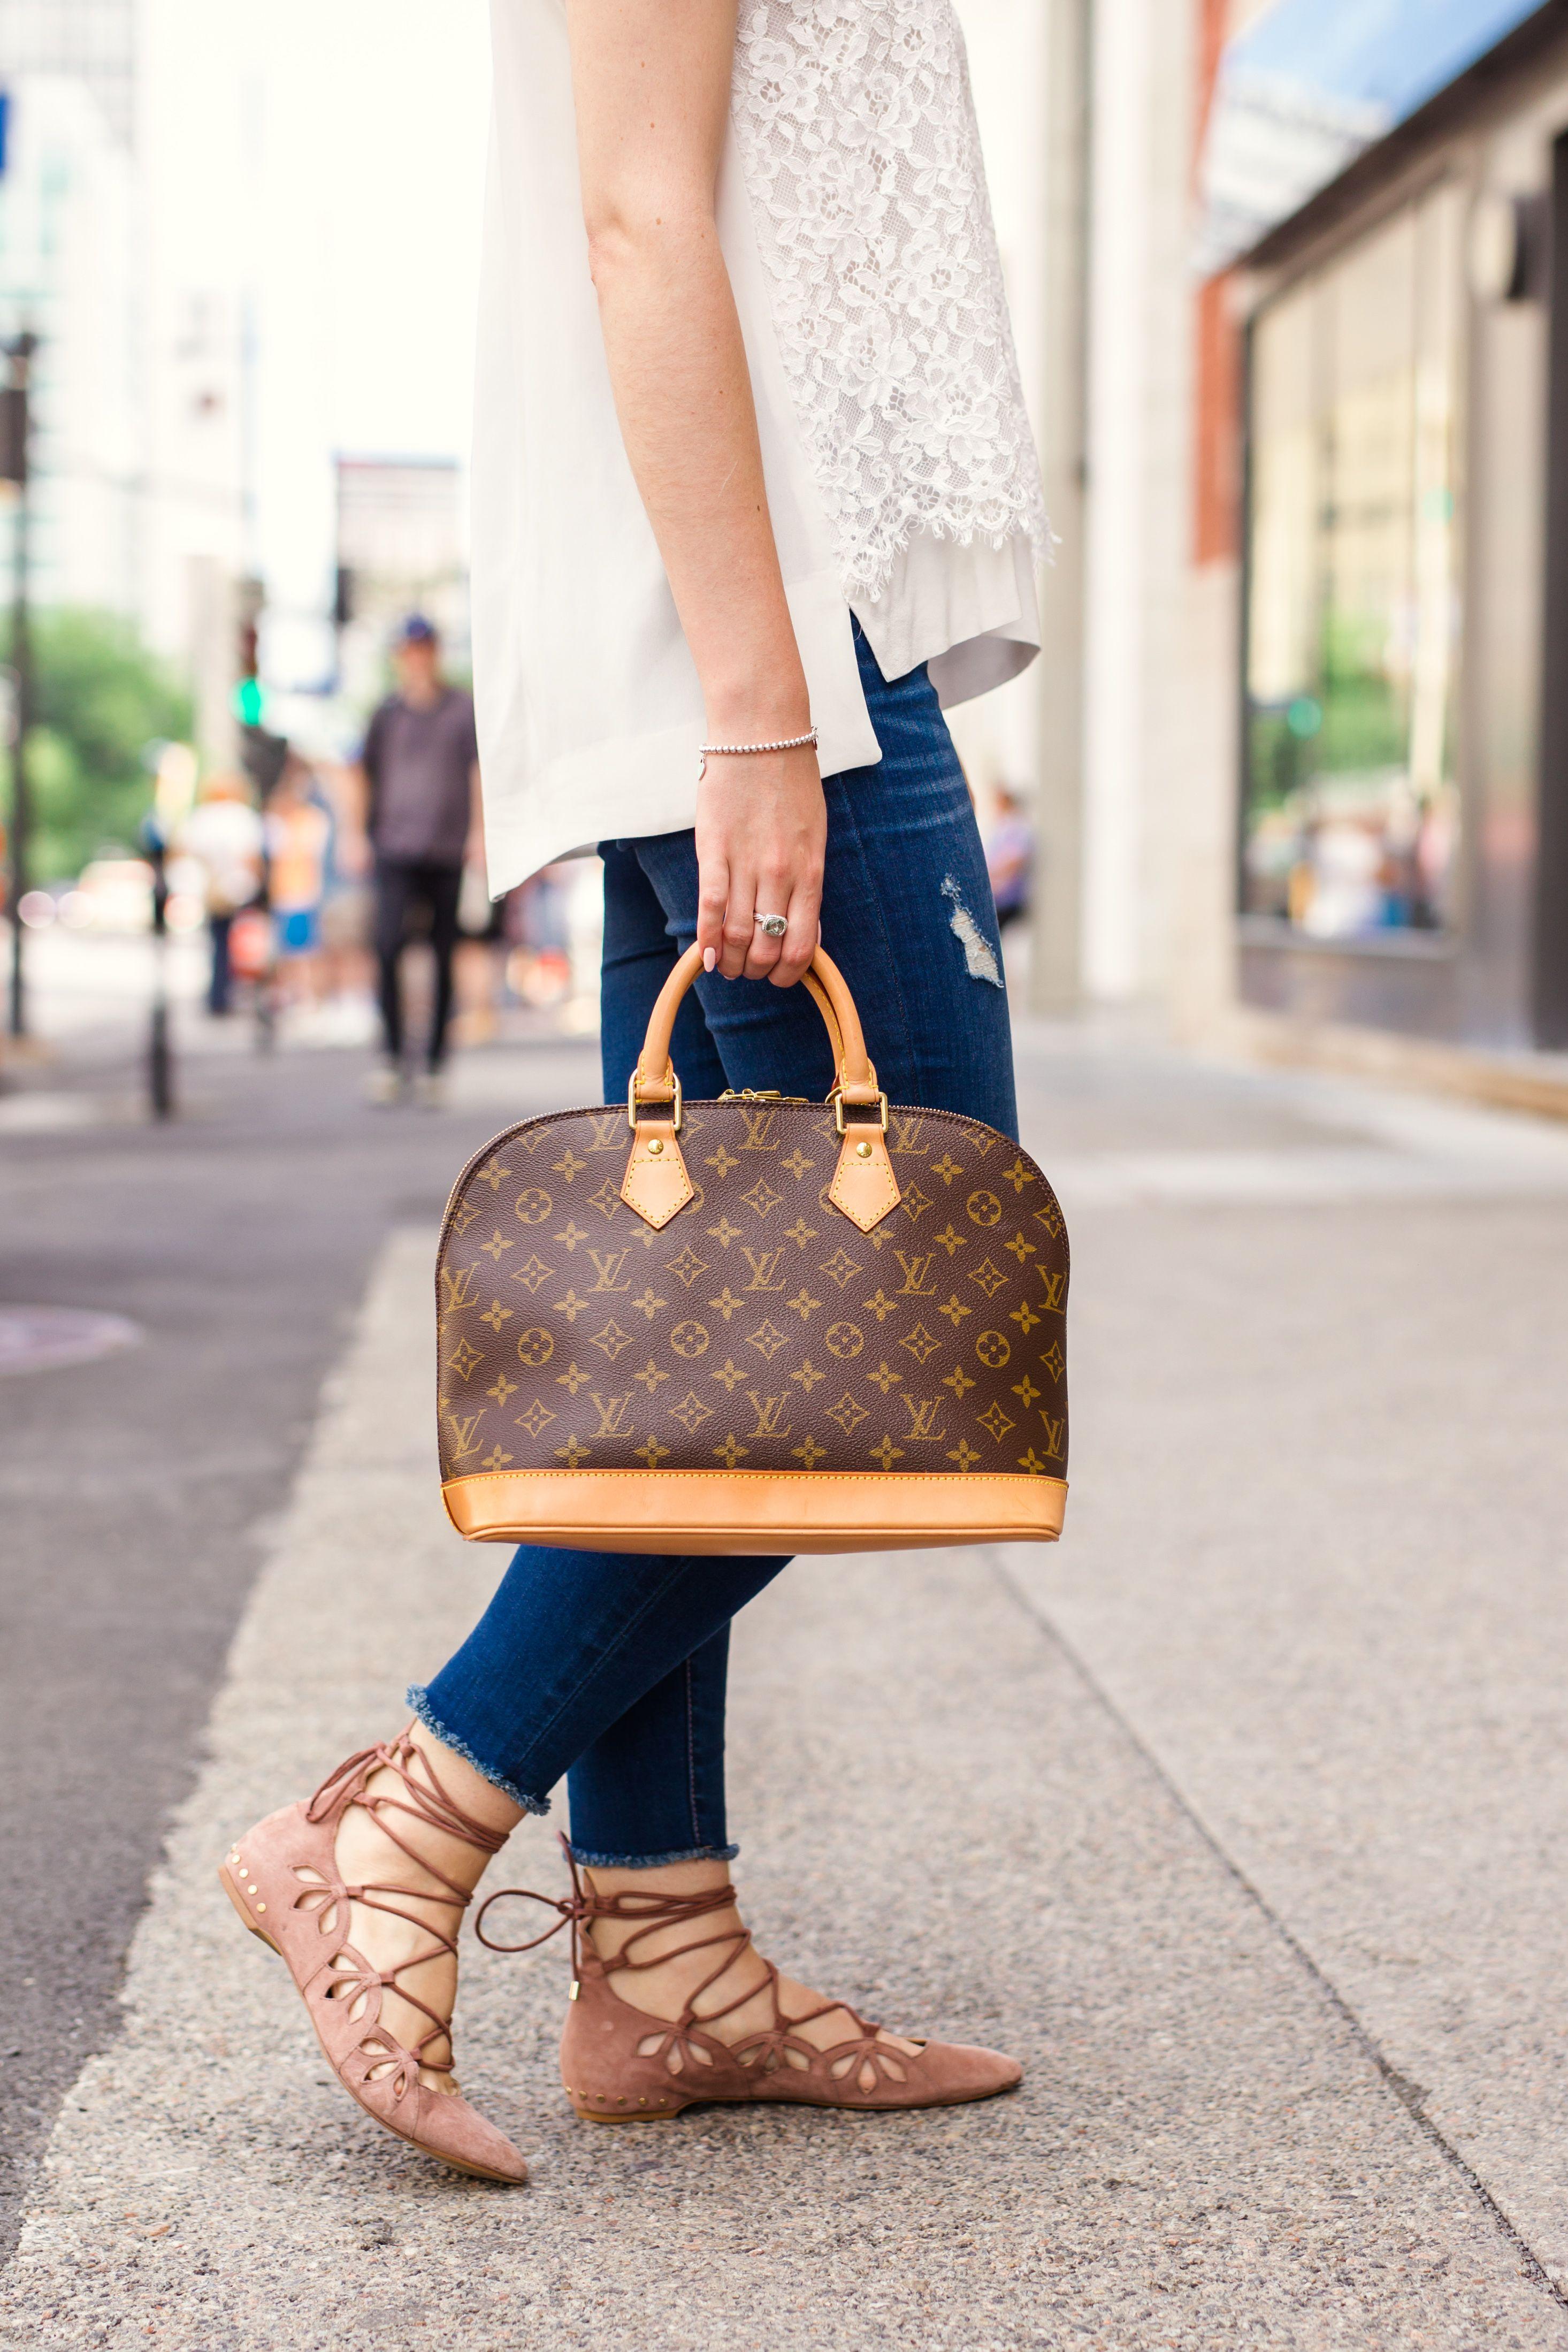 27f945548cd Louis Vuitton Alma PM | Staying in my Luxury Lane | Louis vuitton ...